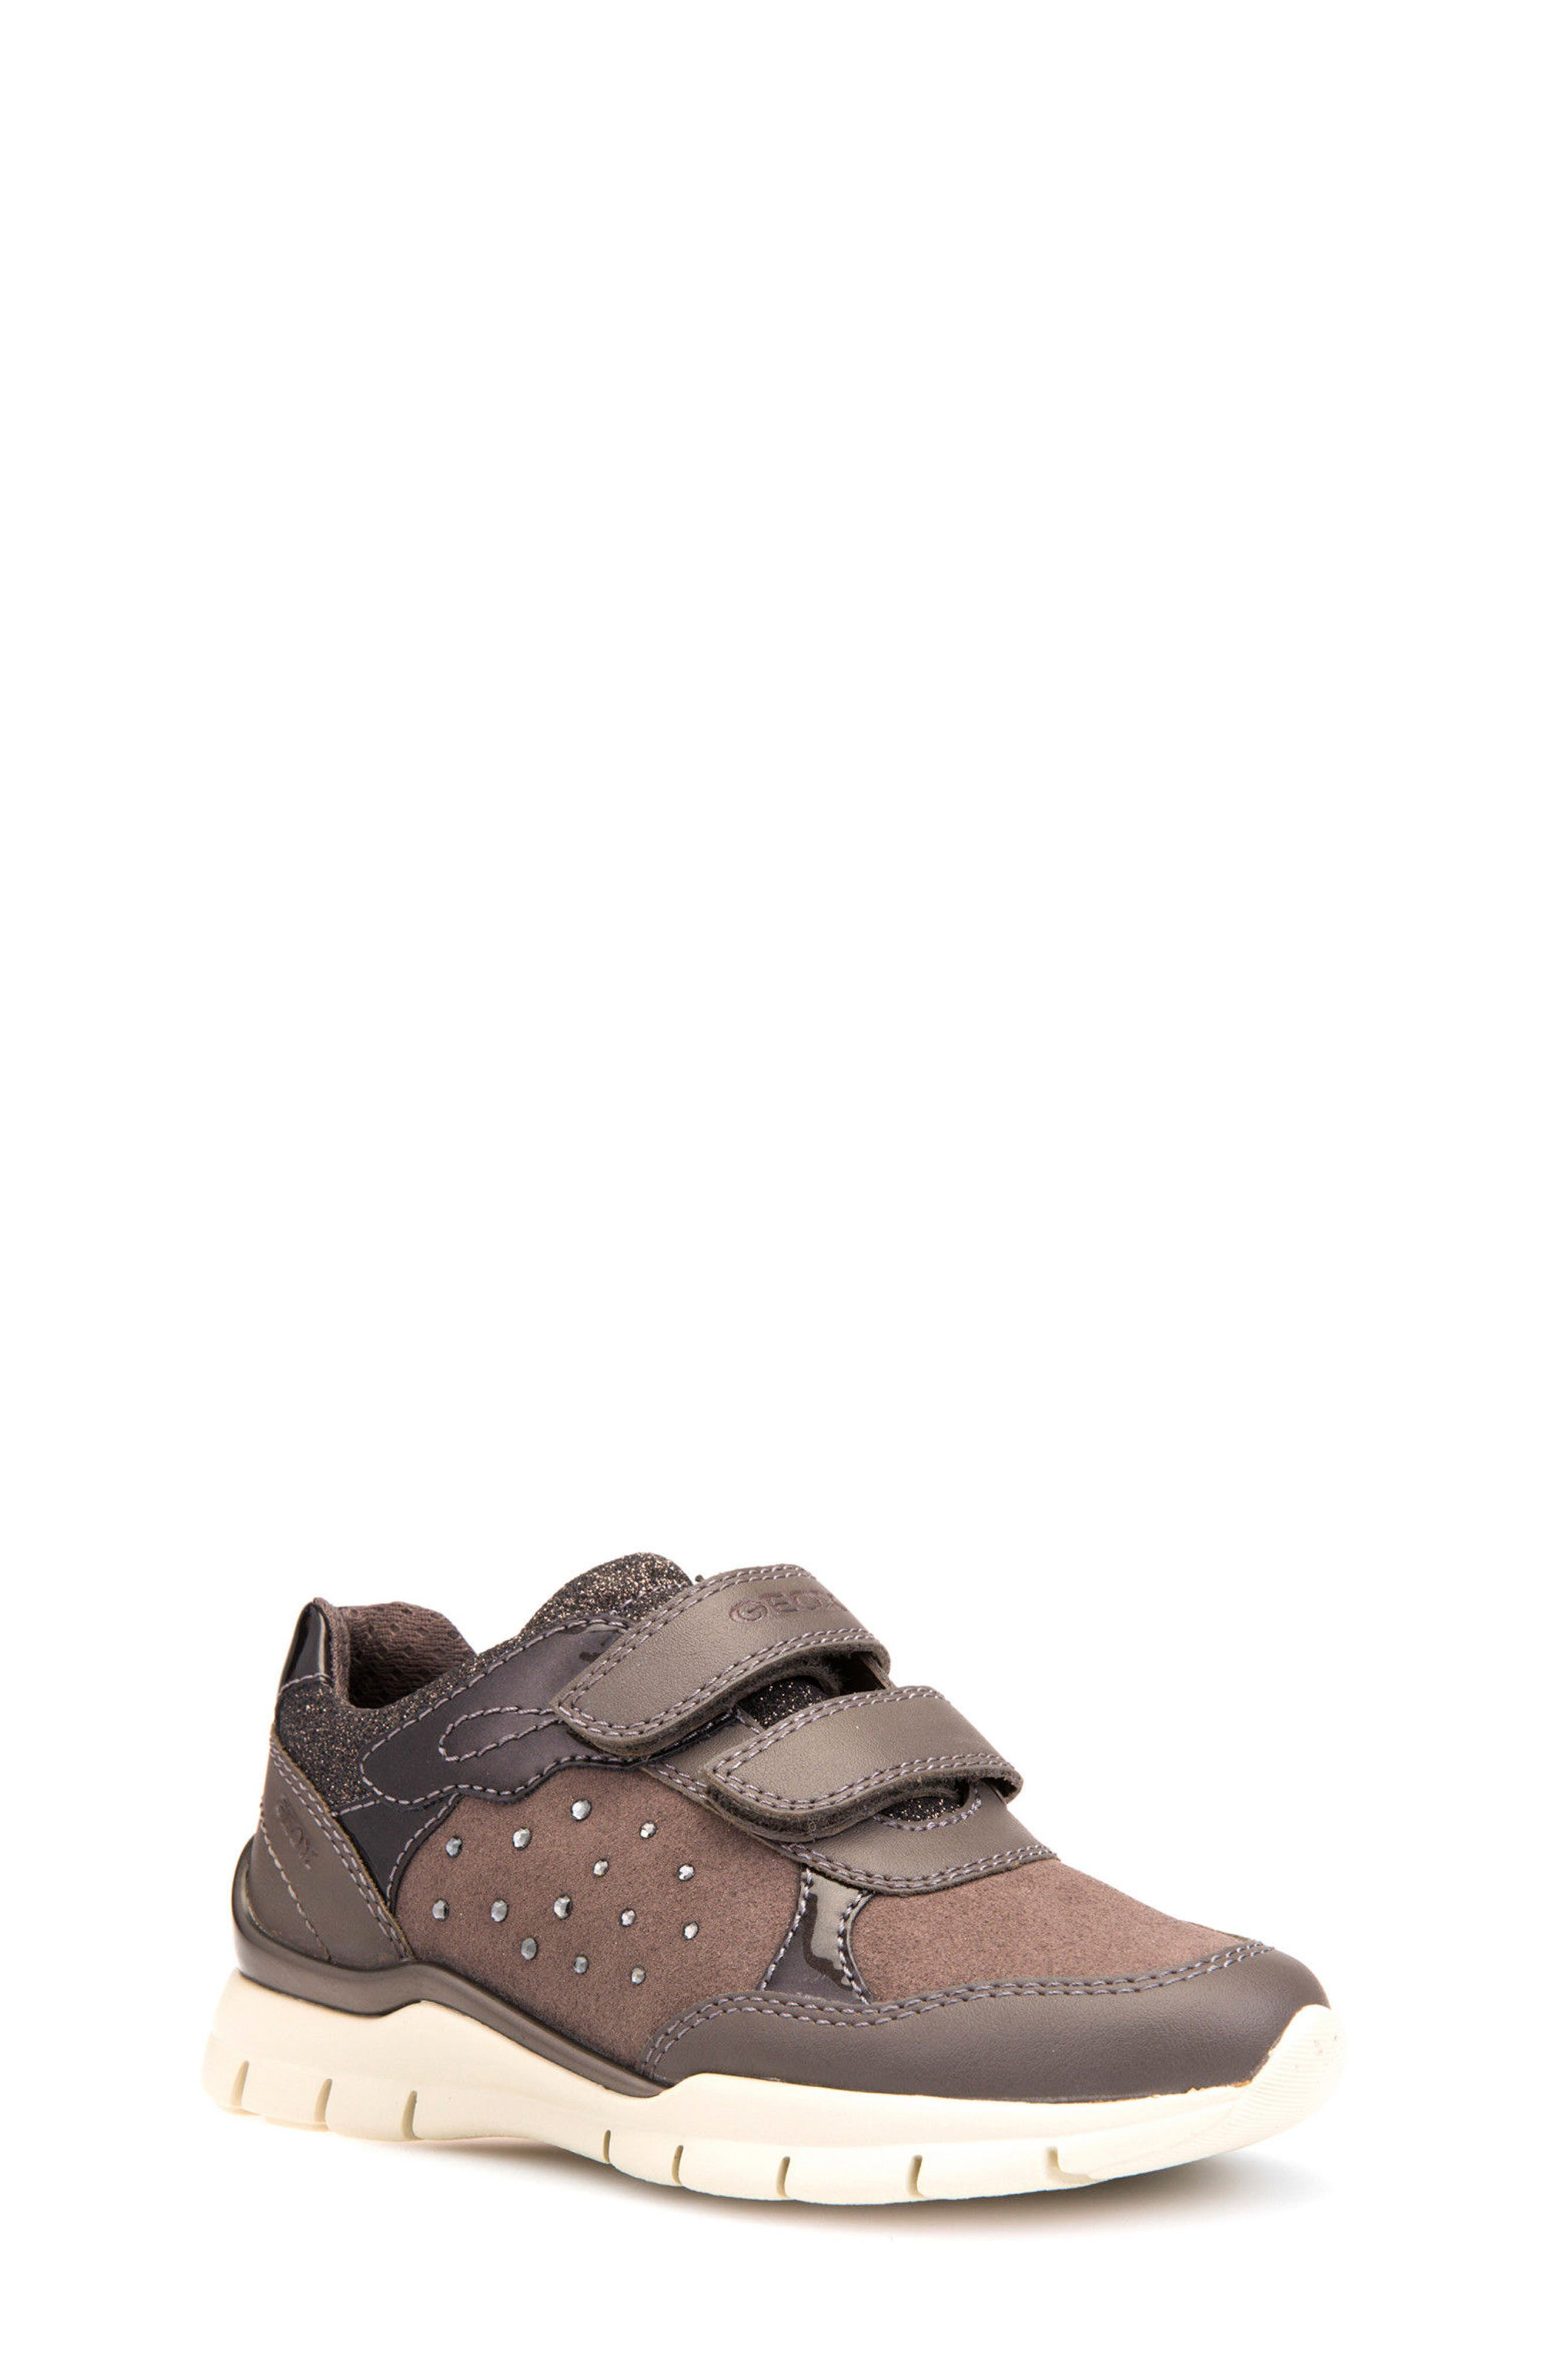 Sukie Sneaker,                             Main thumbnail 1, color,                             200